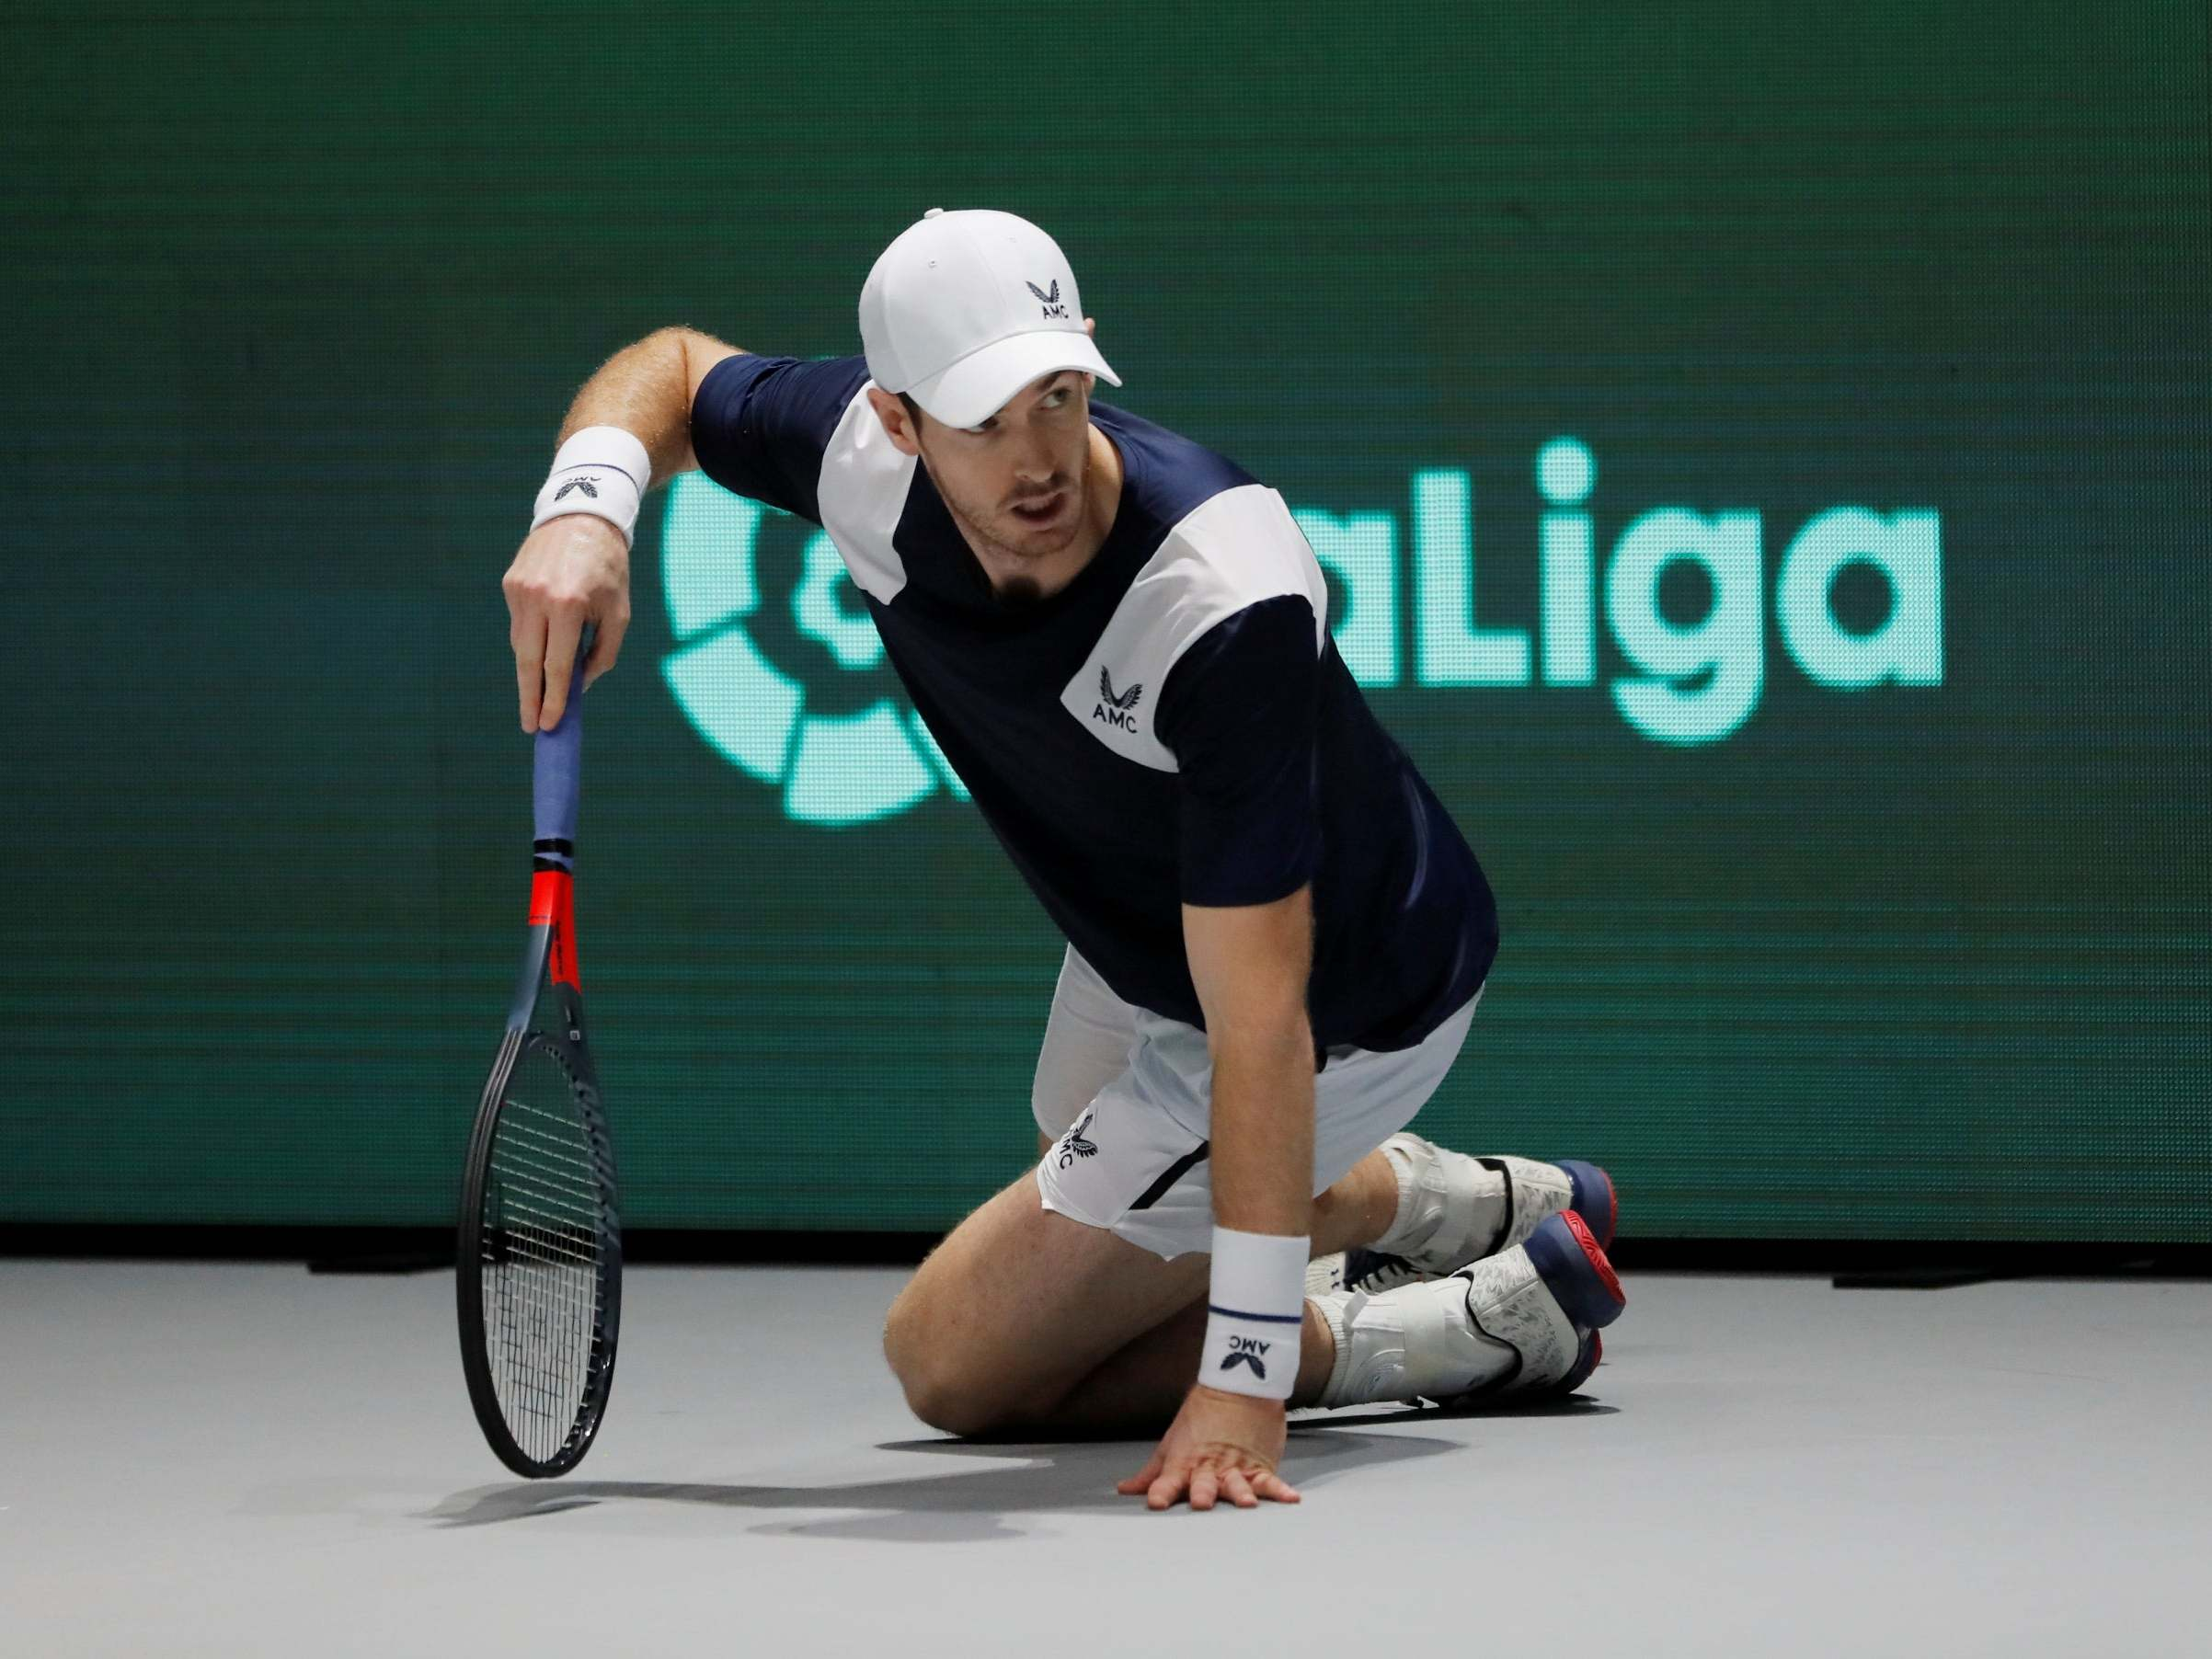 Becker backs Murray to overcome latest injury nightmare